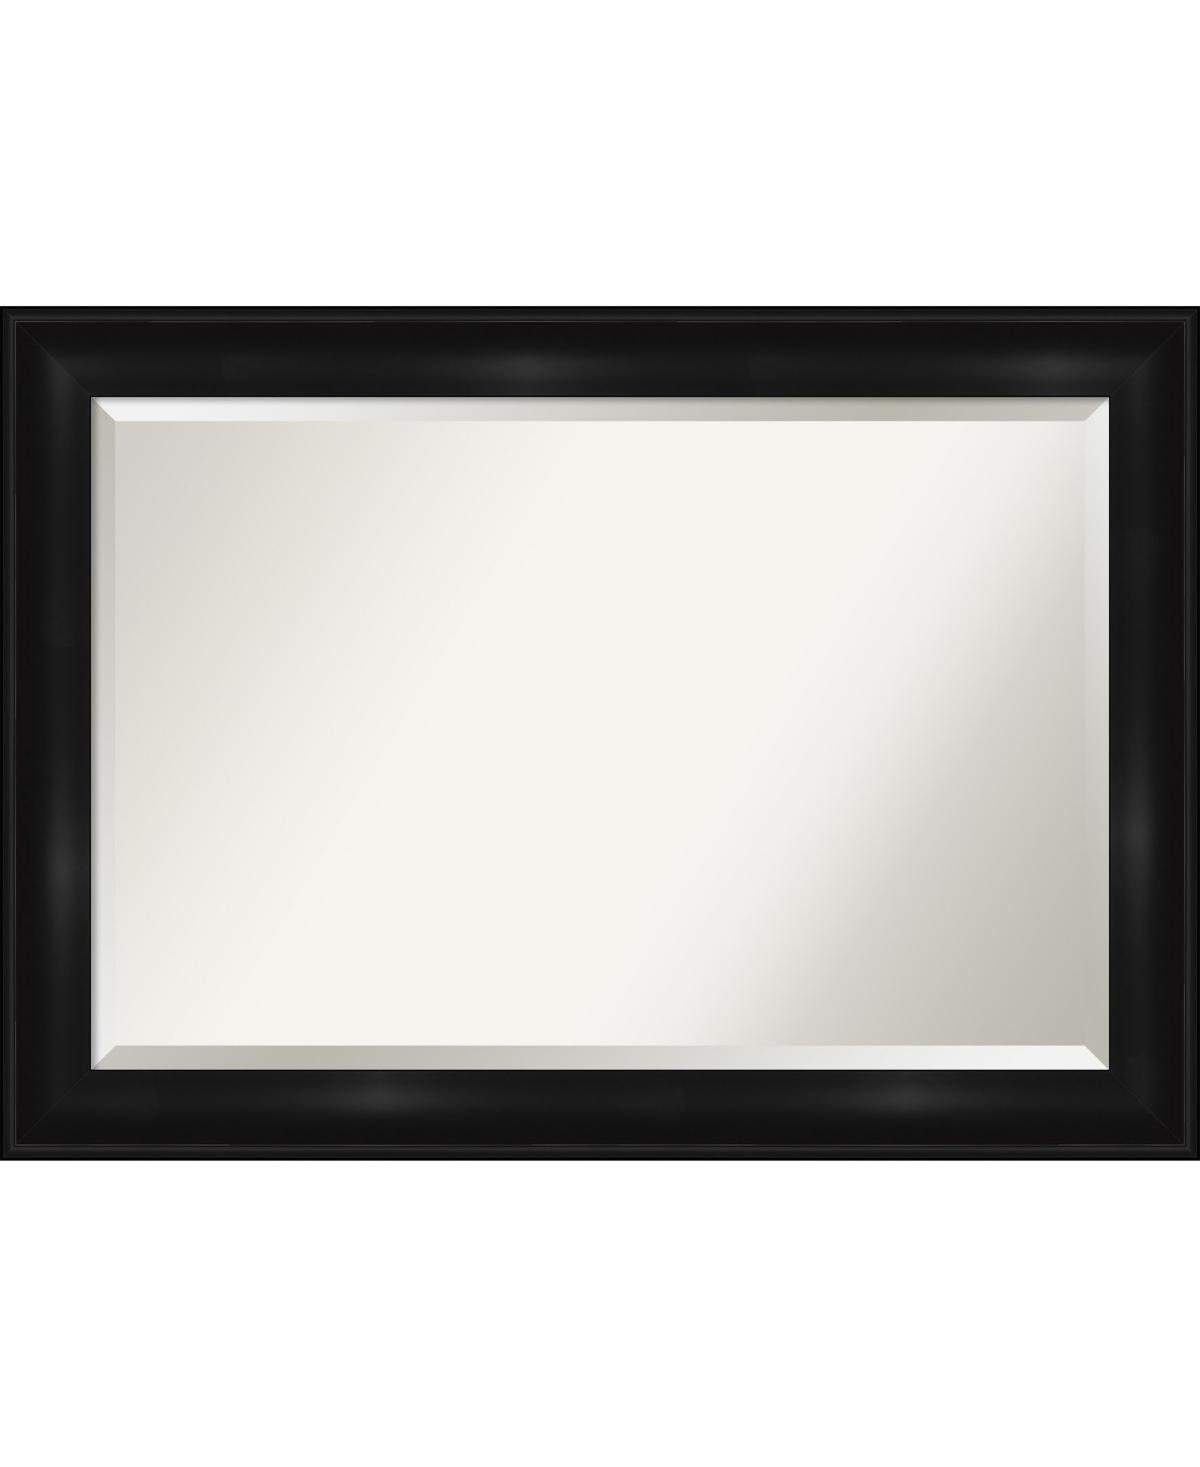 Amanti Art Grand Framed Bathroom Vanity Wall Mirror, 41.75